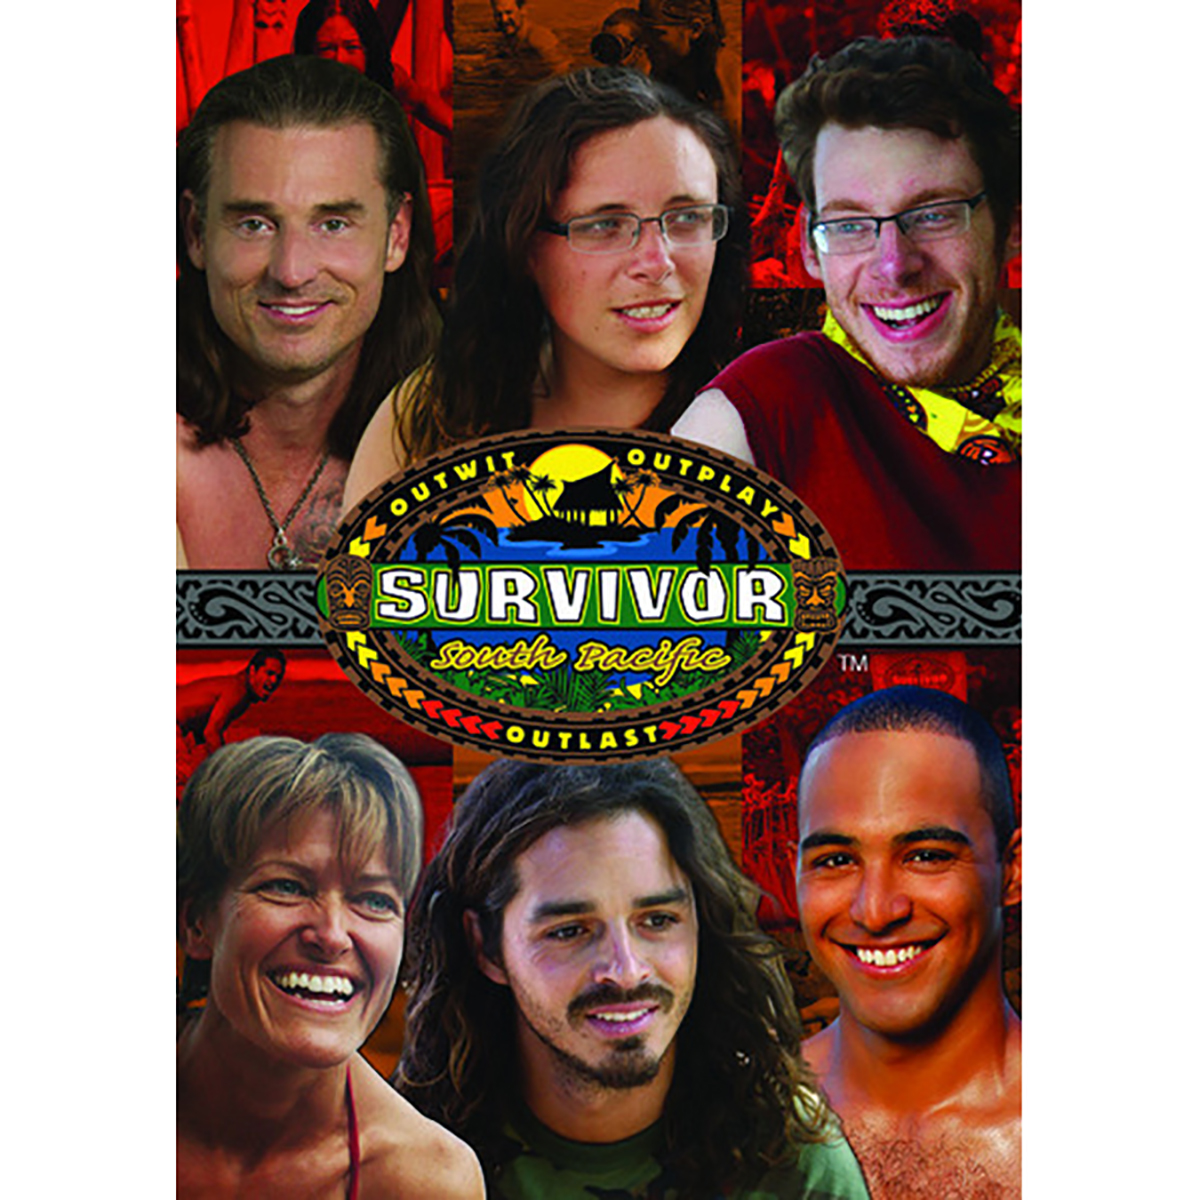 Survivor: Season 23 - South Pacific DVD